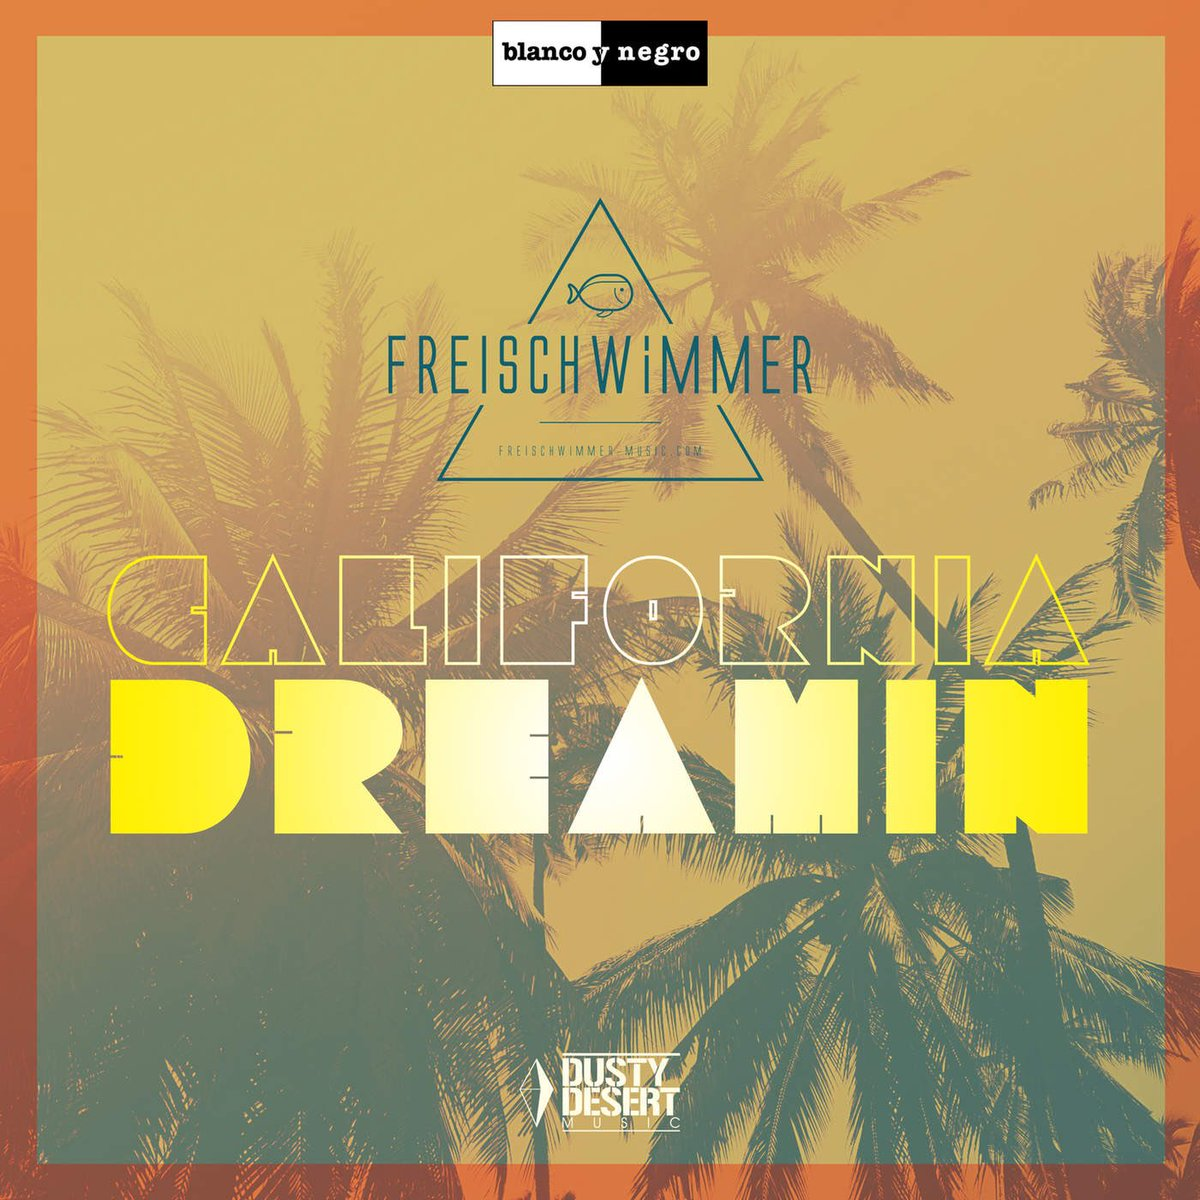 Maxima 51 Chart: Nº1 Freischwimmer - California Dreamin